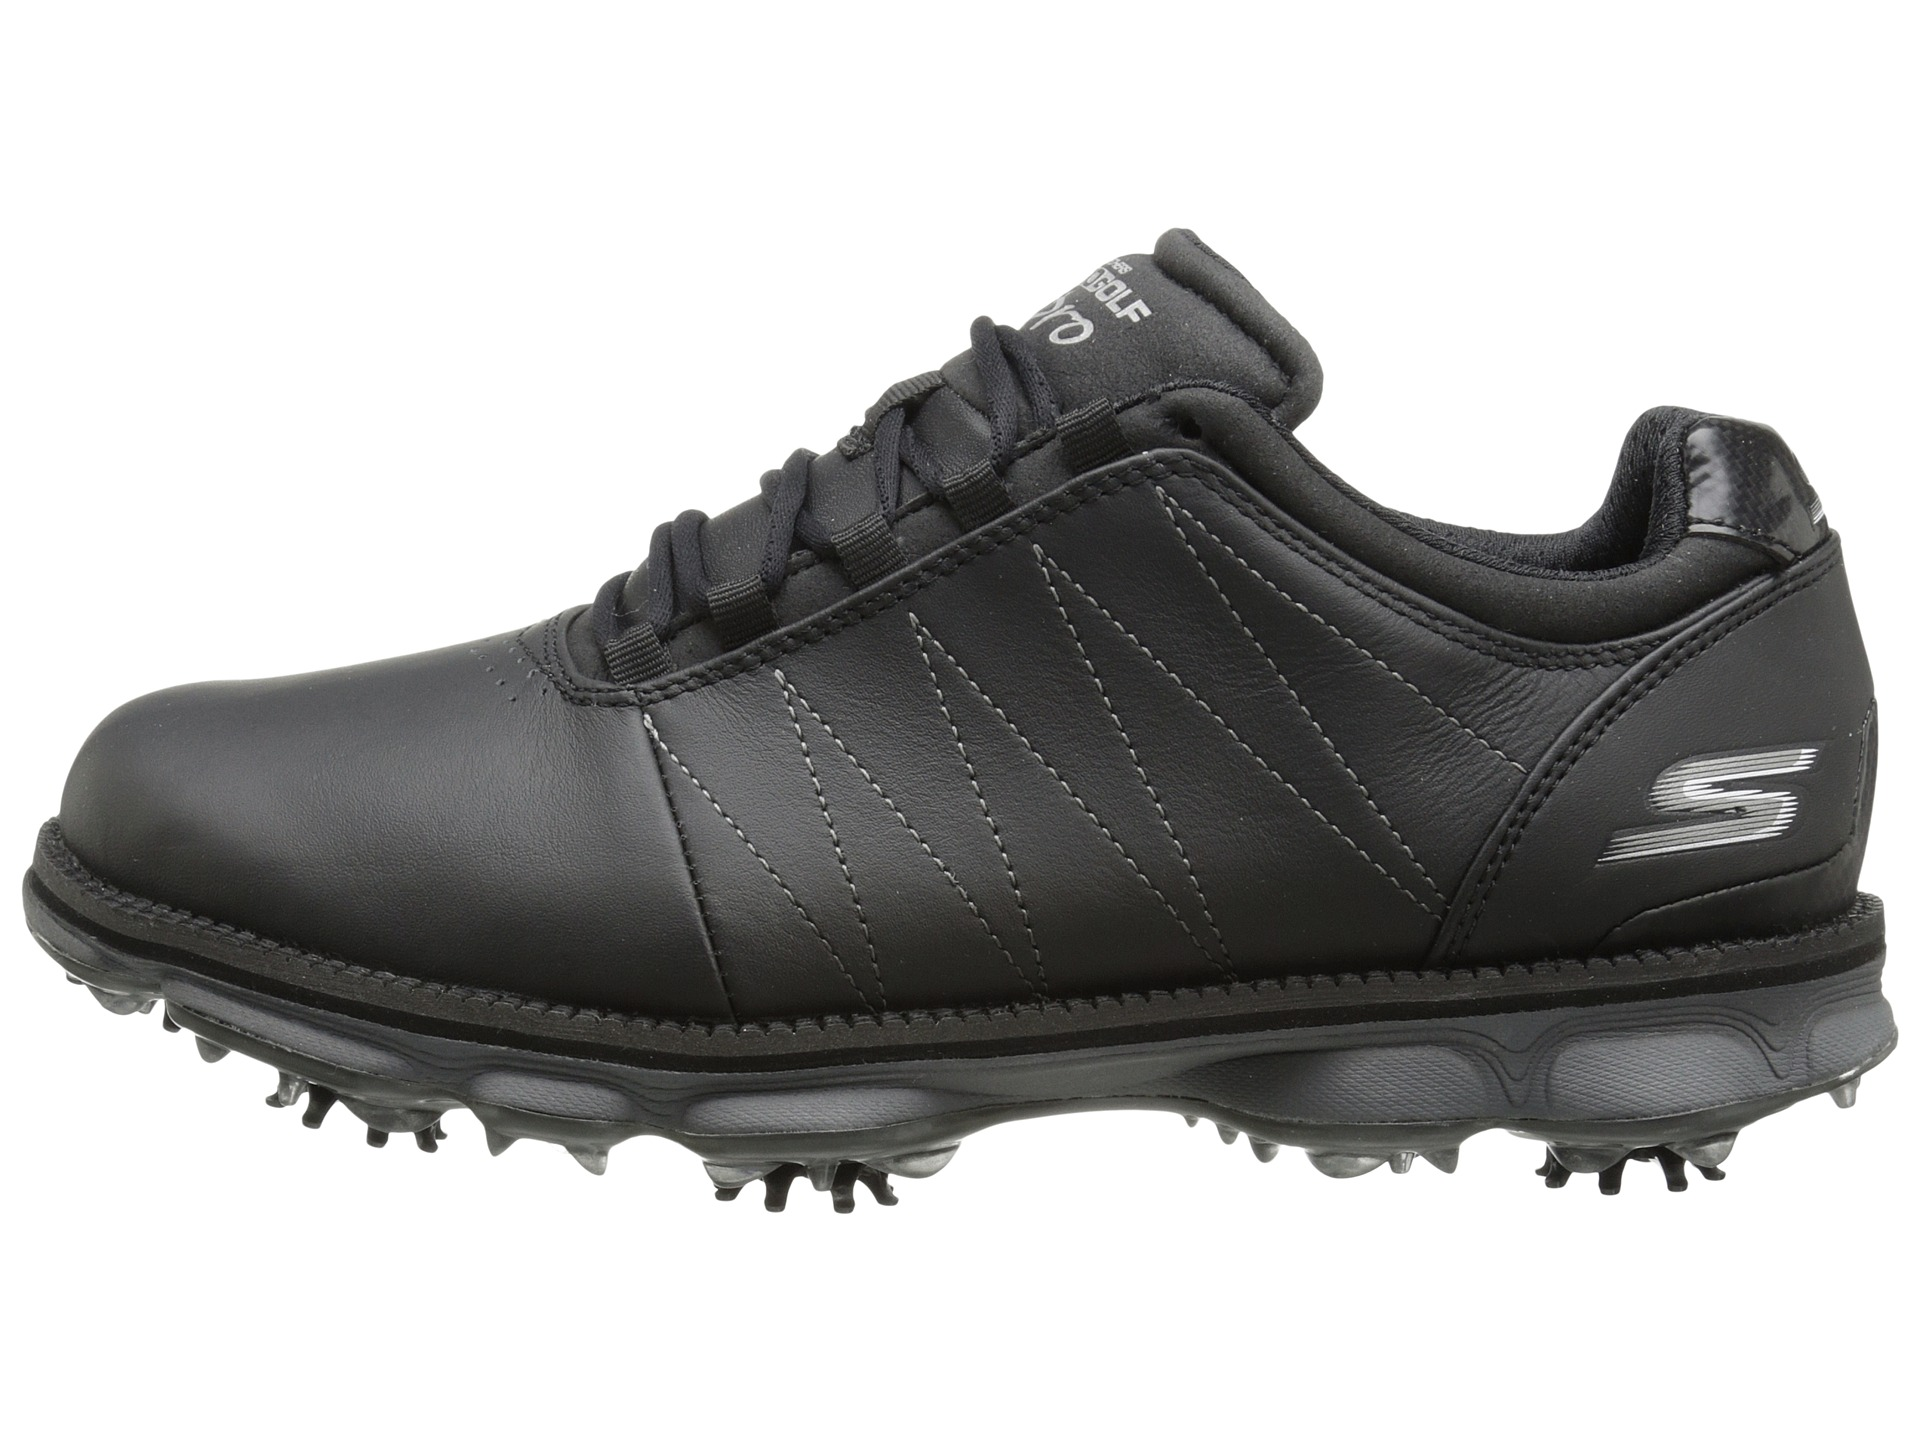 Skechers Golf Shoes Narrow